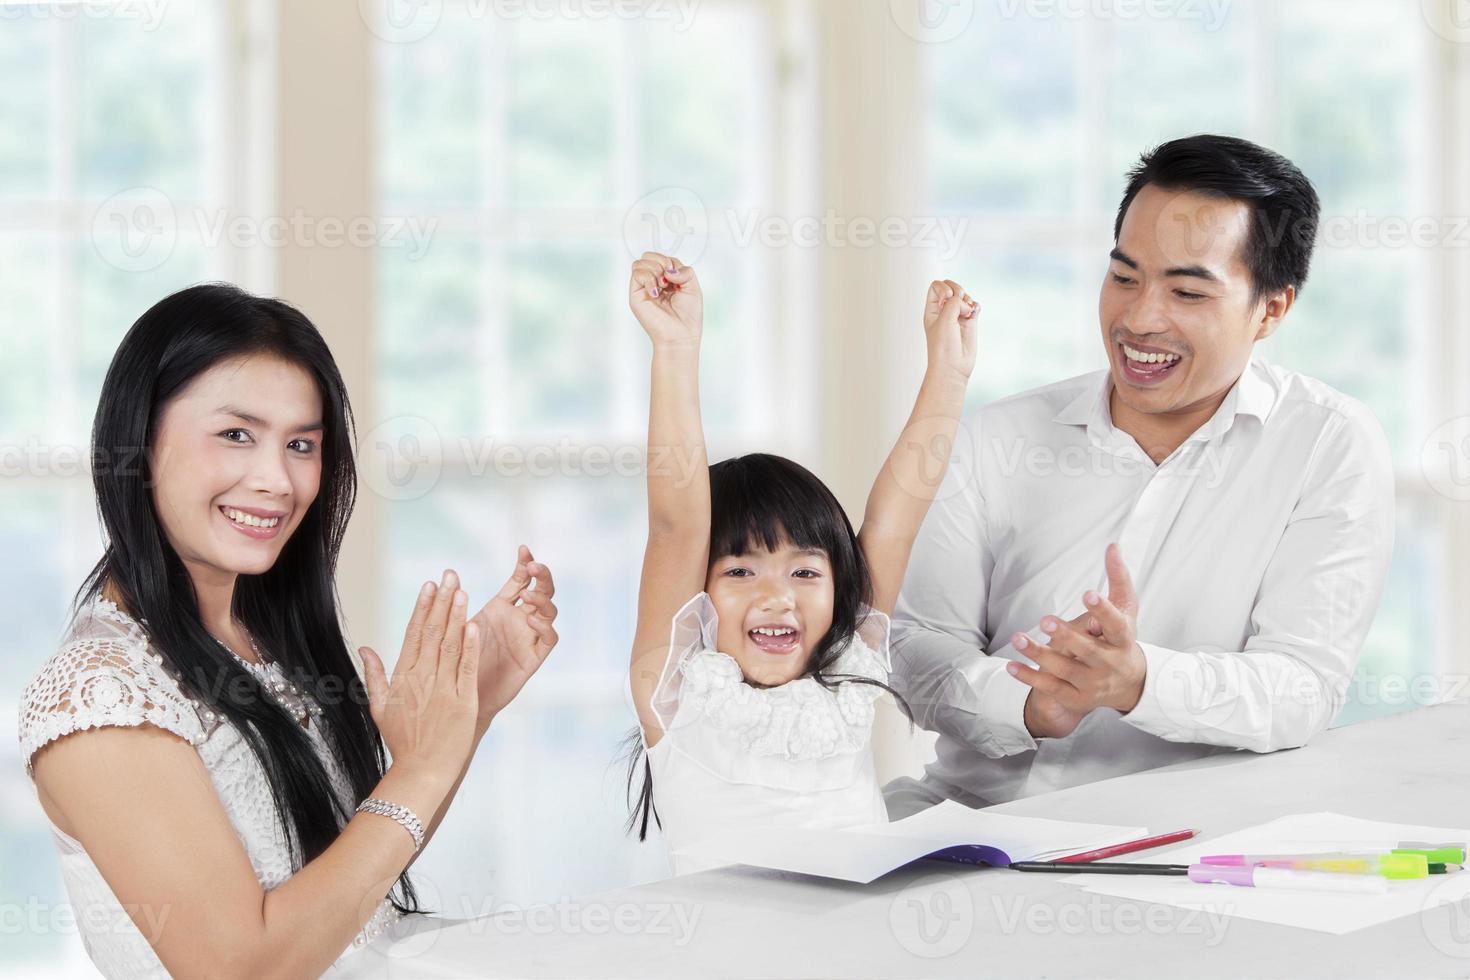 Joyful family finishing schoolwork together photo